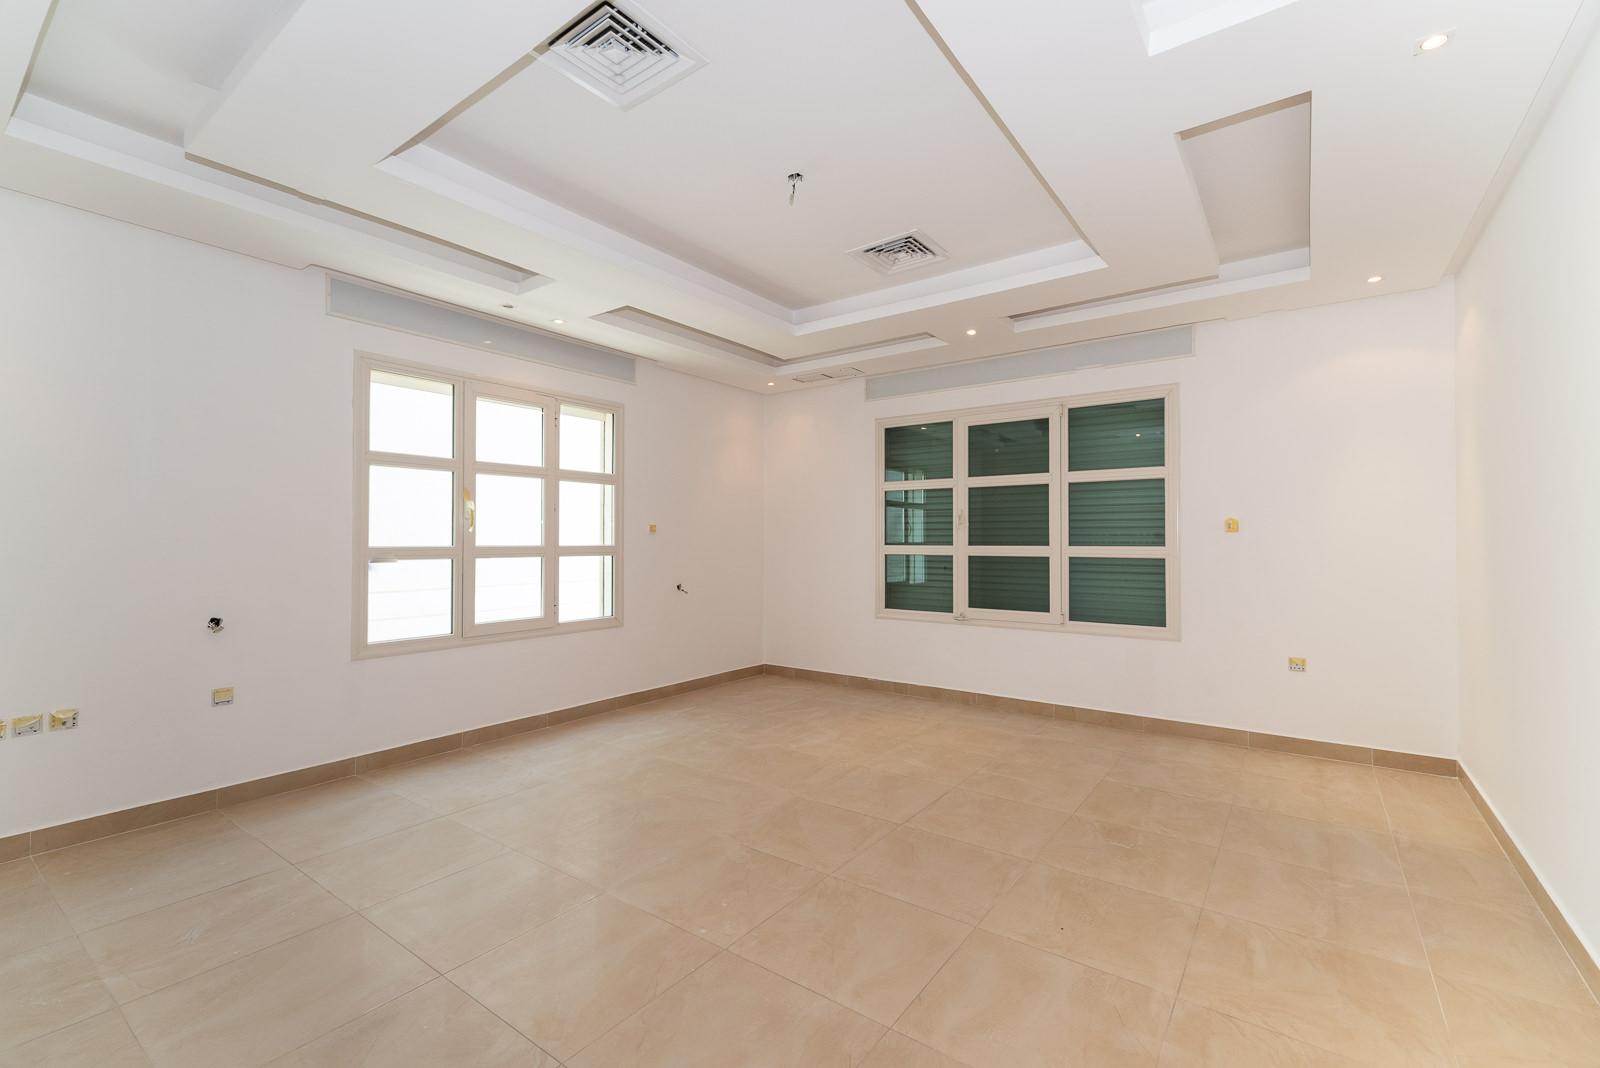 Mishref – very nice, spacious, four bedroom floor